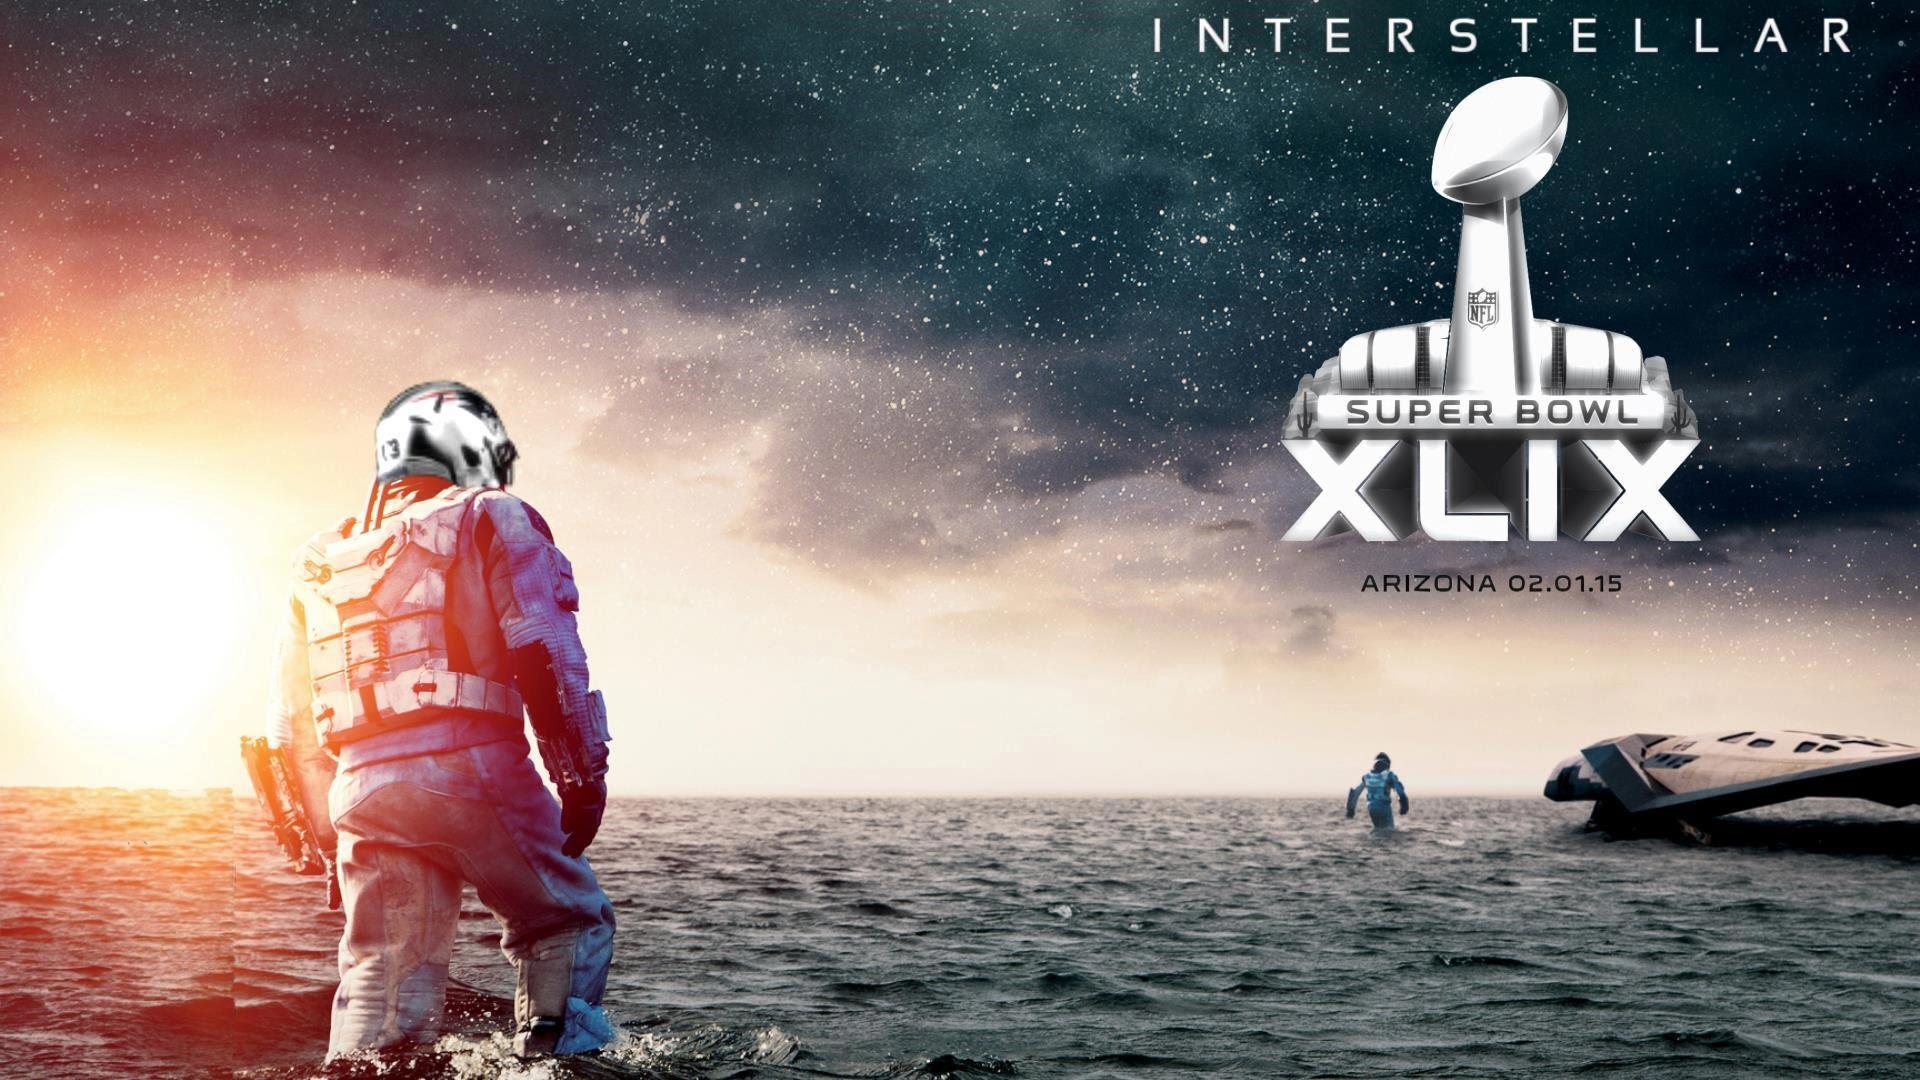 New England Patriots 2015 NFL Playoffs Interstellar Mix Destination 1920x1080